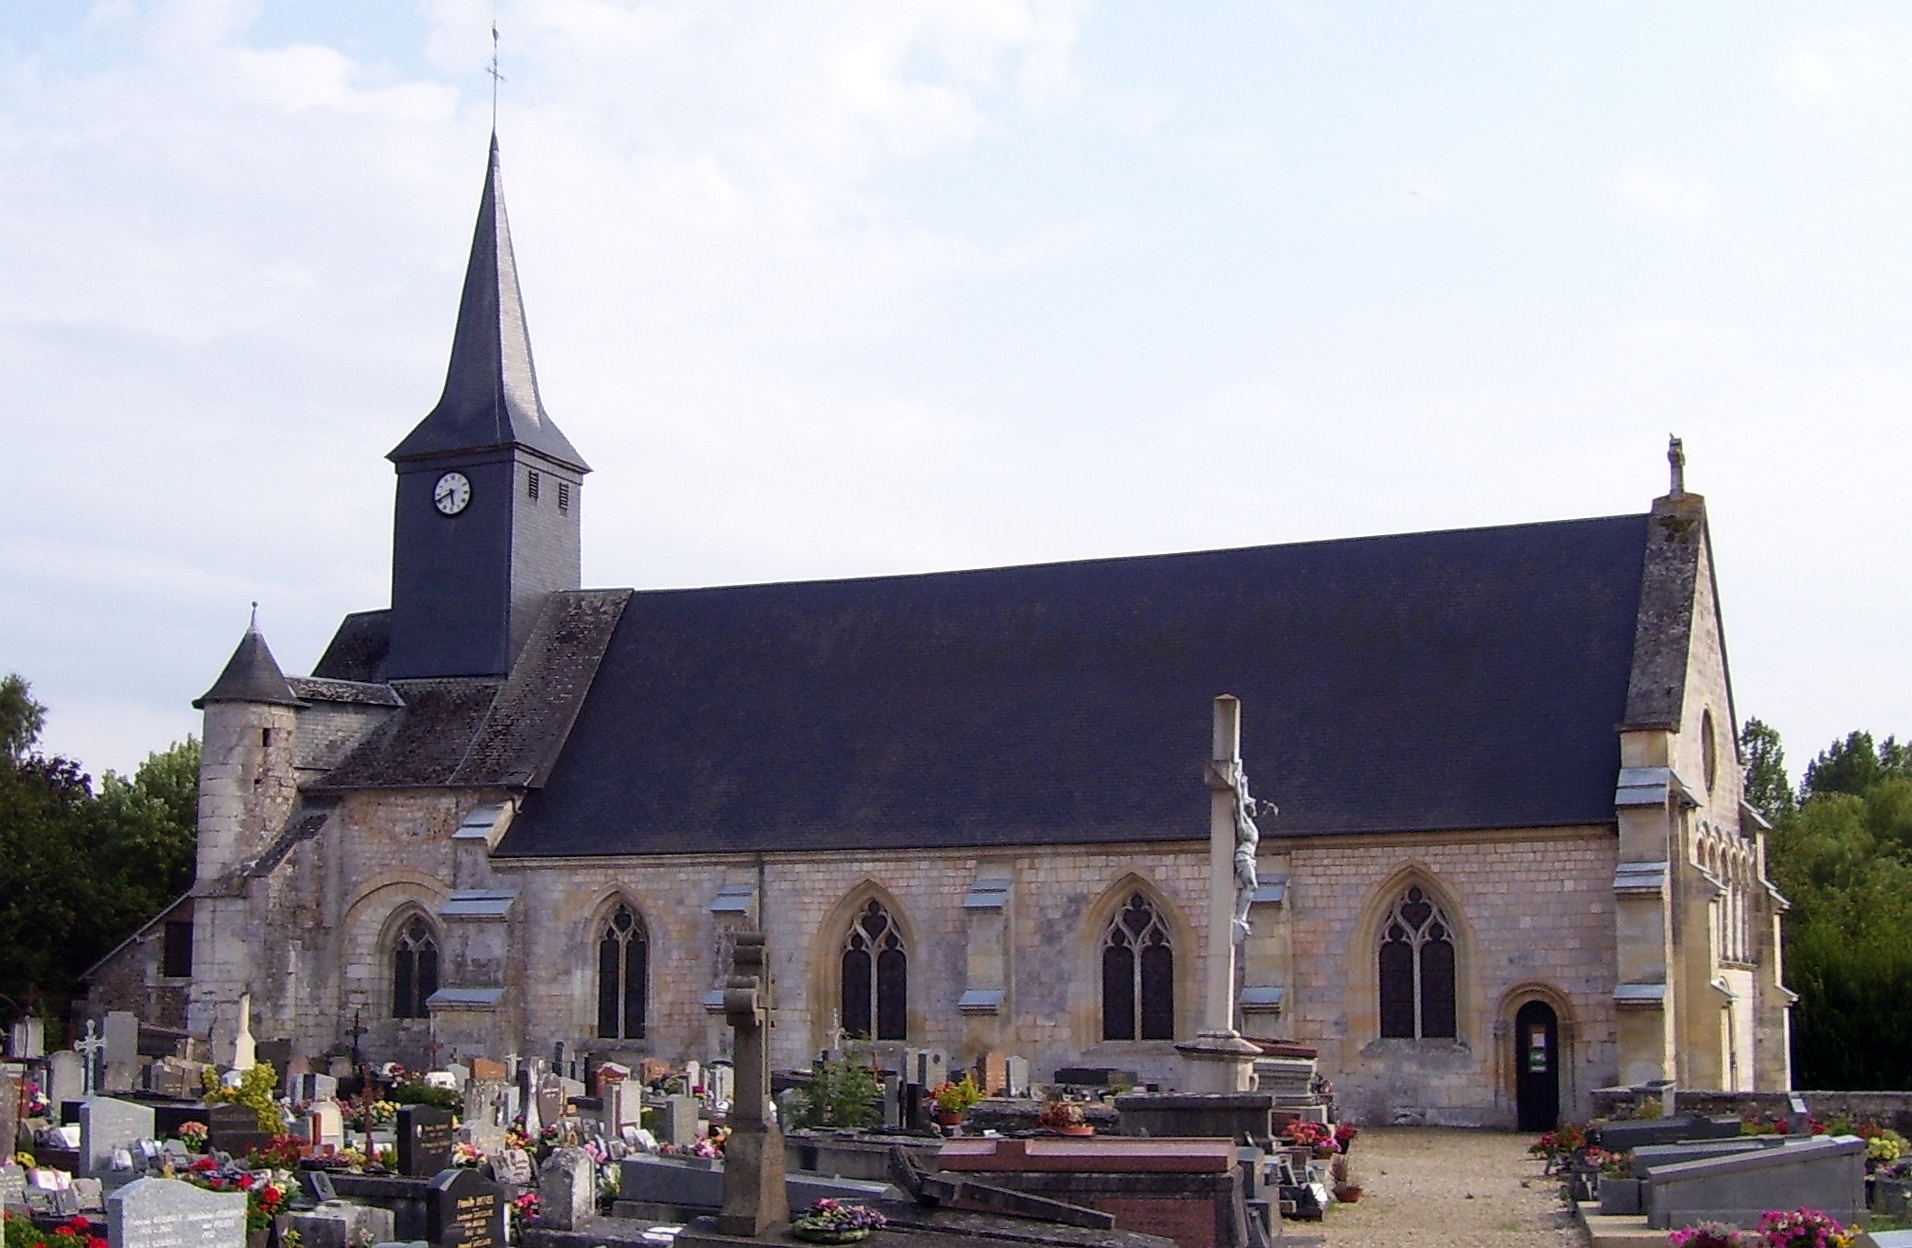 Kirche Notre-Dame in Corneville, eigenes Foto (auf commons), Lizenz:public domain/gemeinfrei